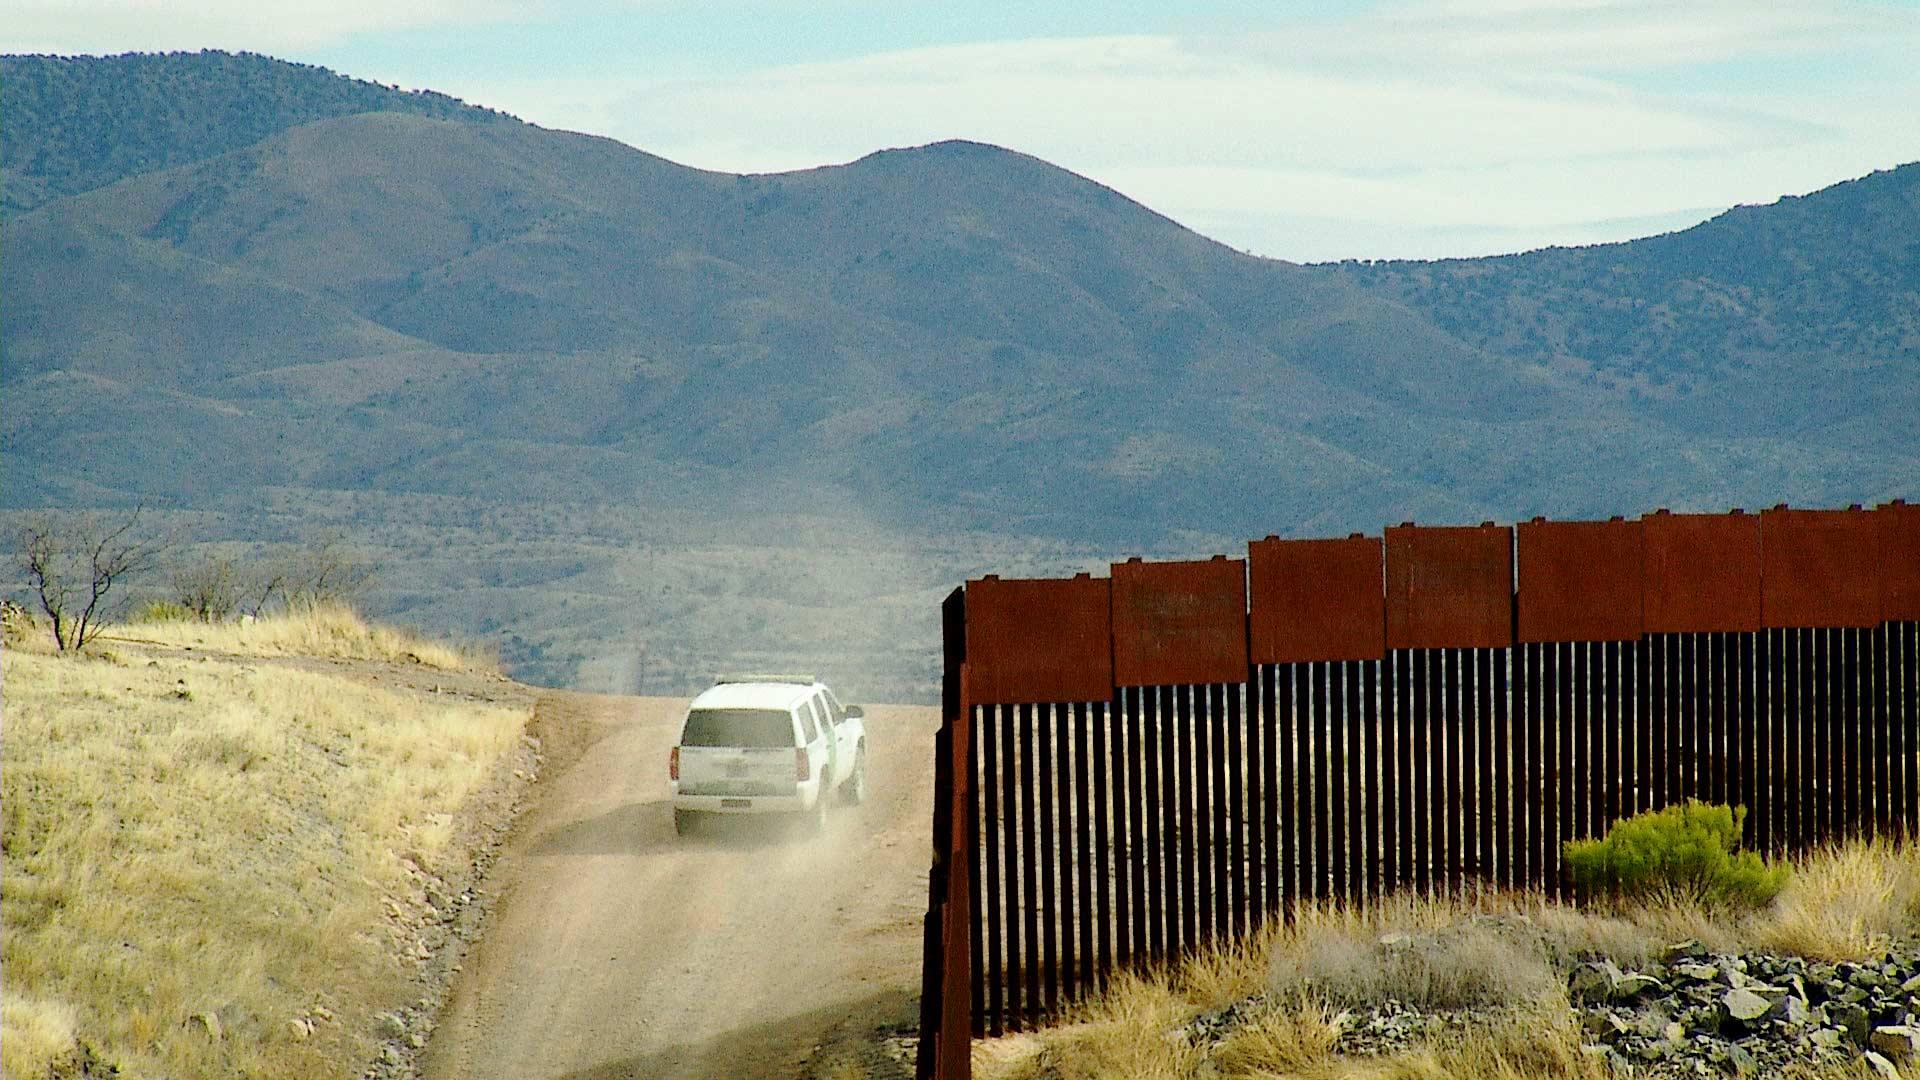 File image of a Border Patrol vehicle on patrol along the Arizona-Mexico border.